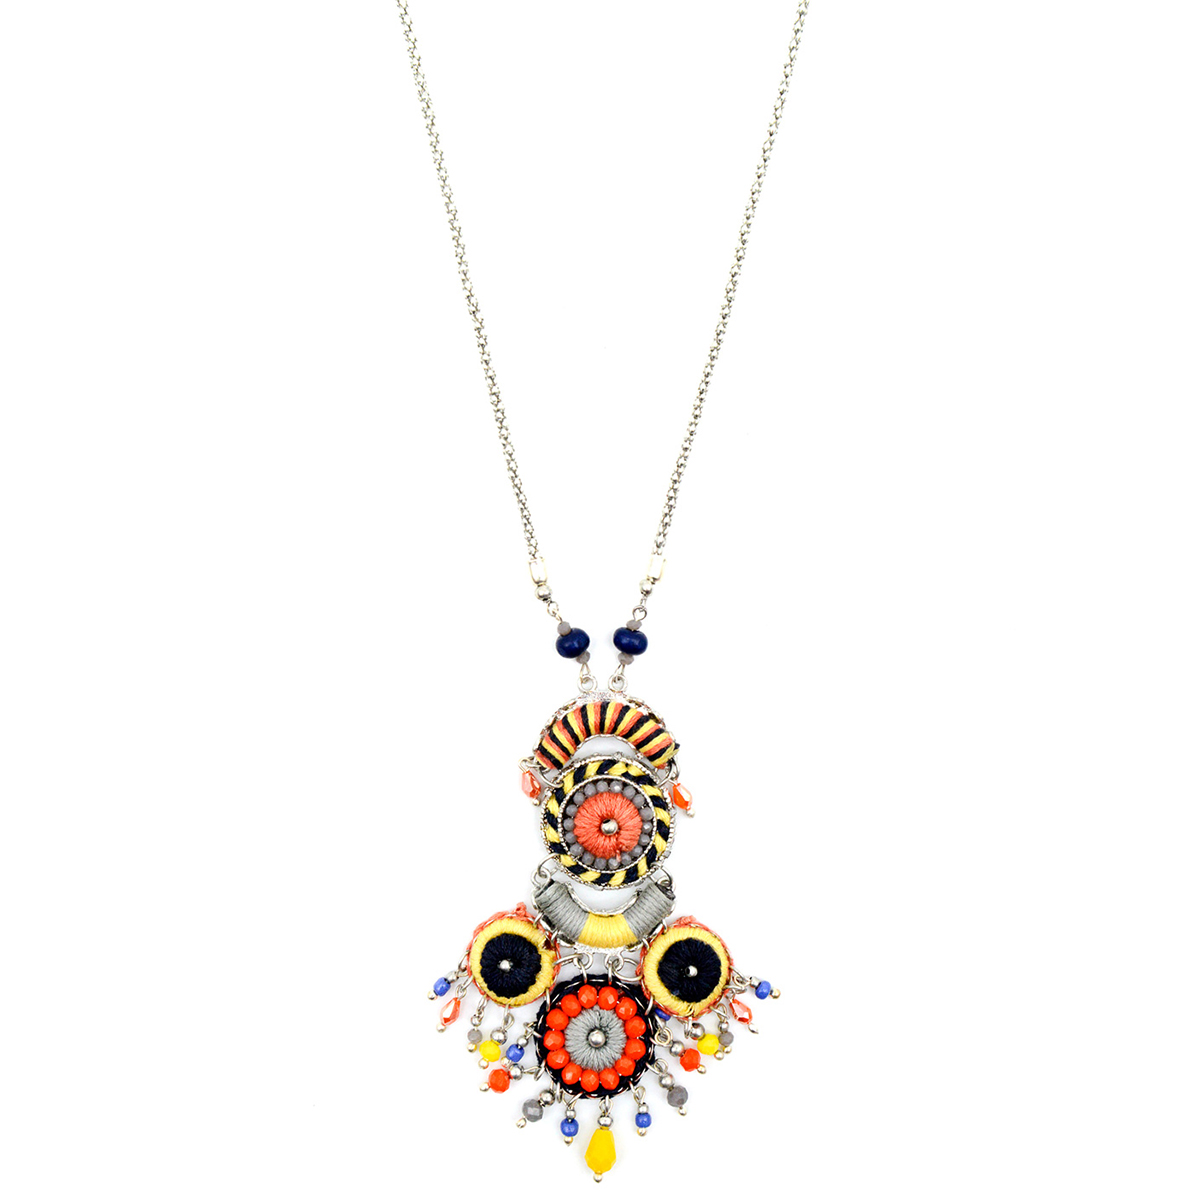 Ornate pendant necklace